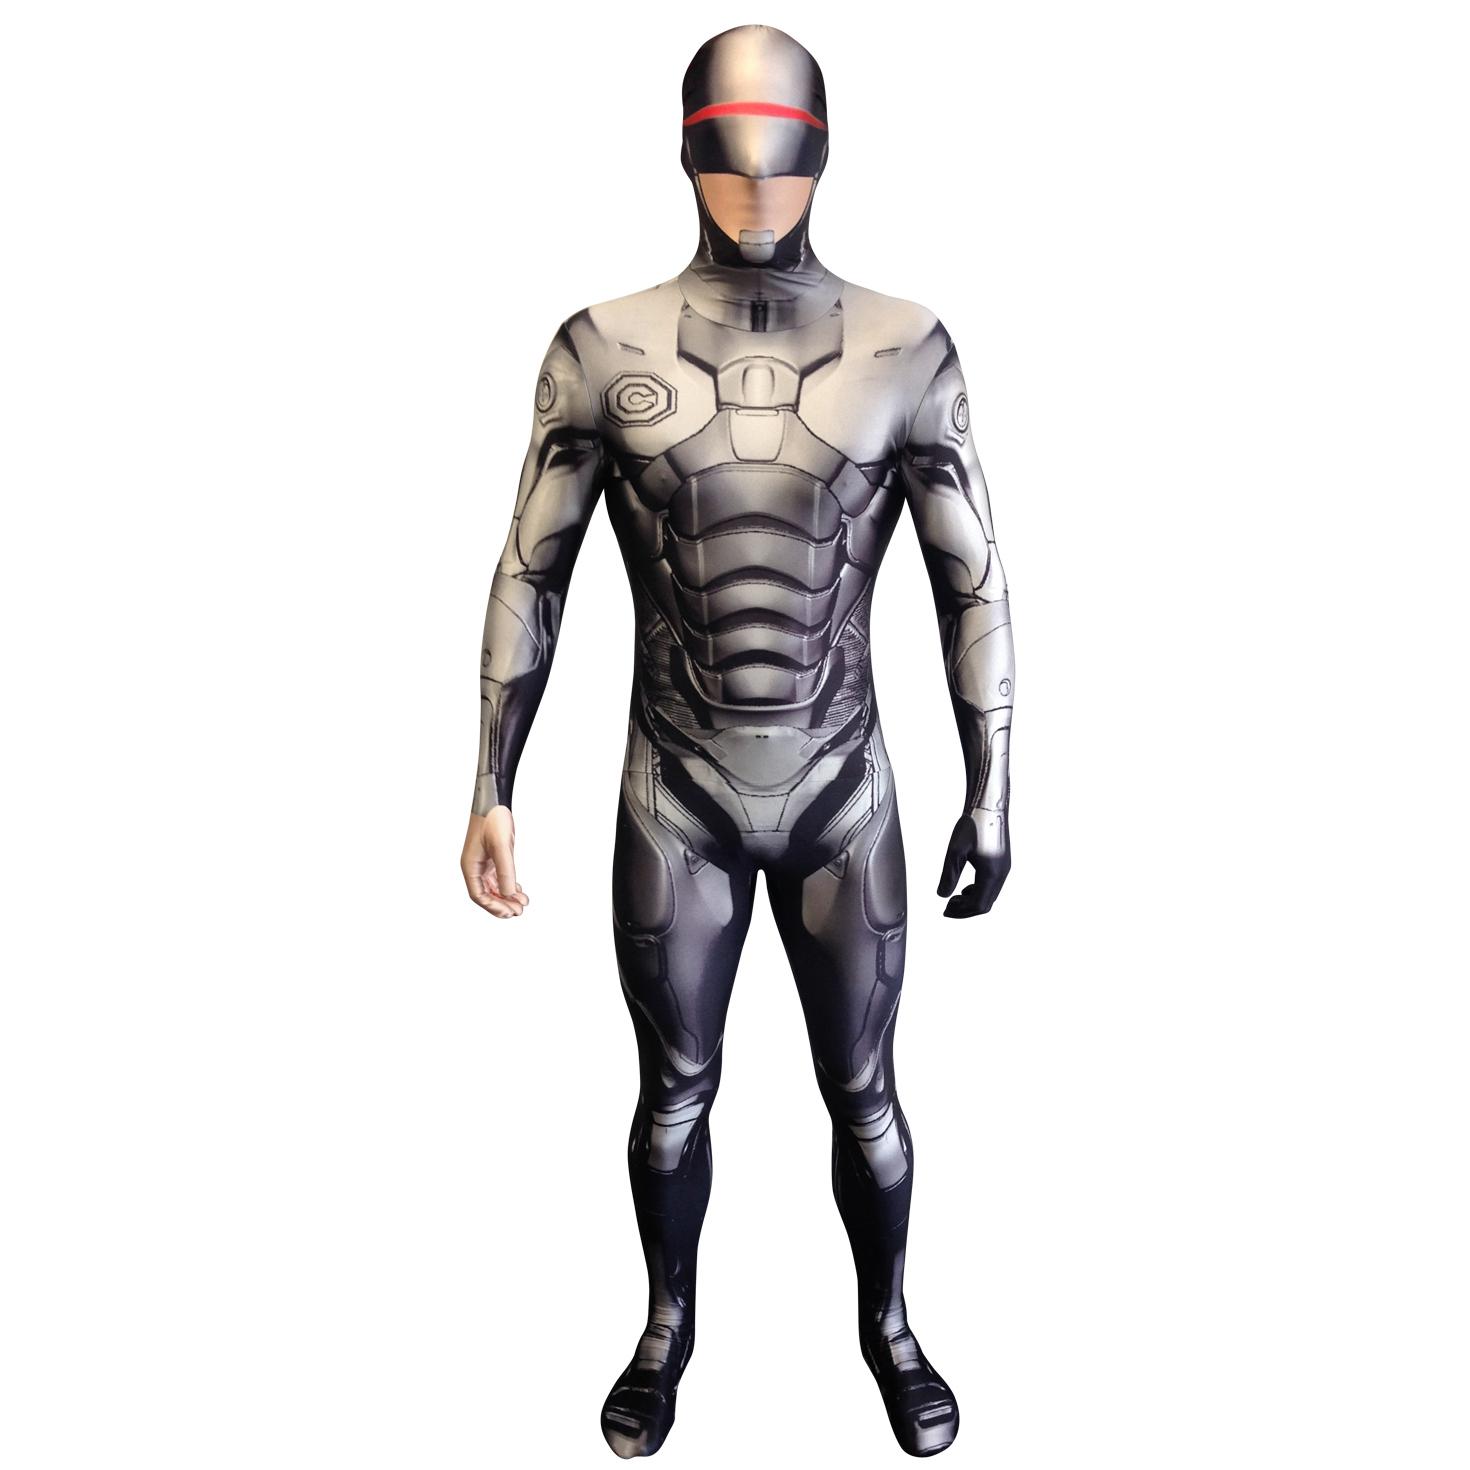 Sale Morphsuit Robocop Fancy Dress Costume Great For Festival